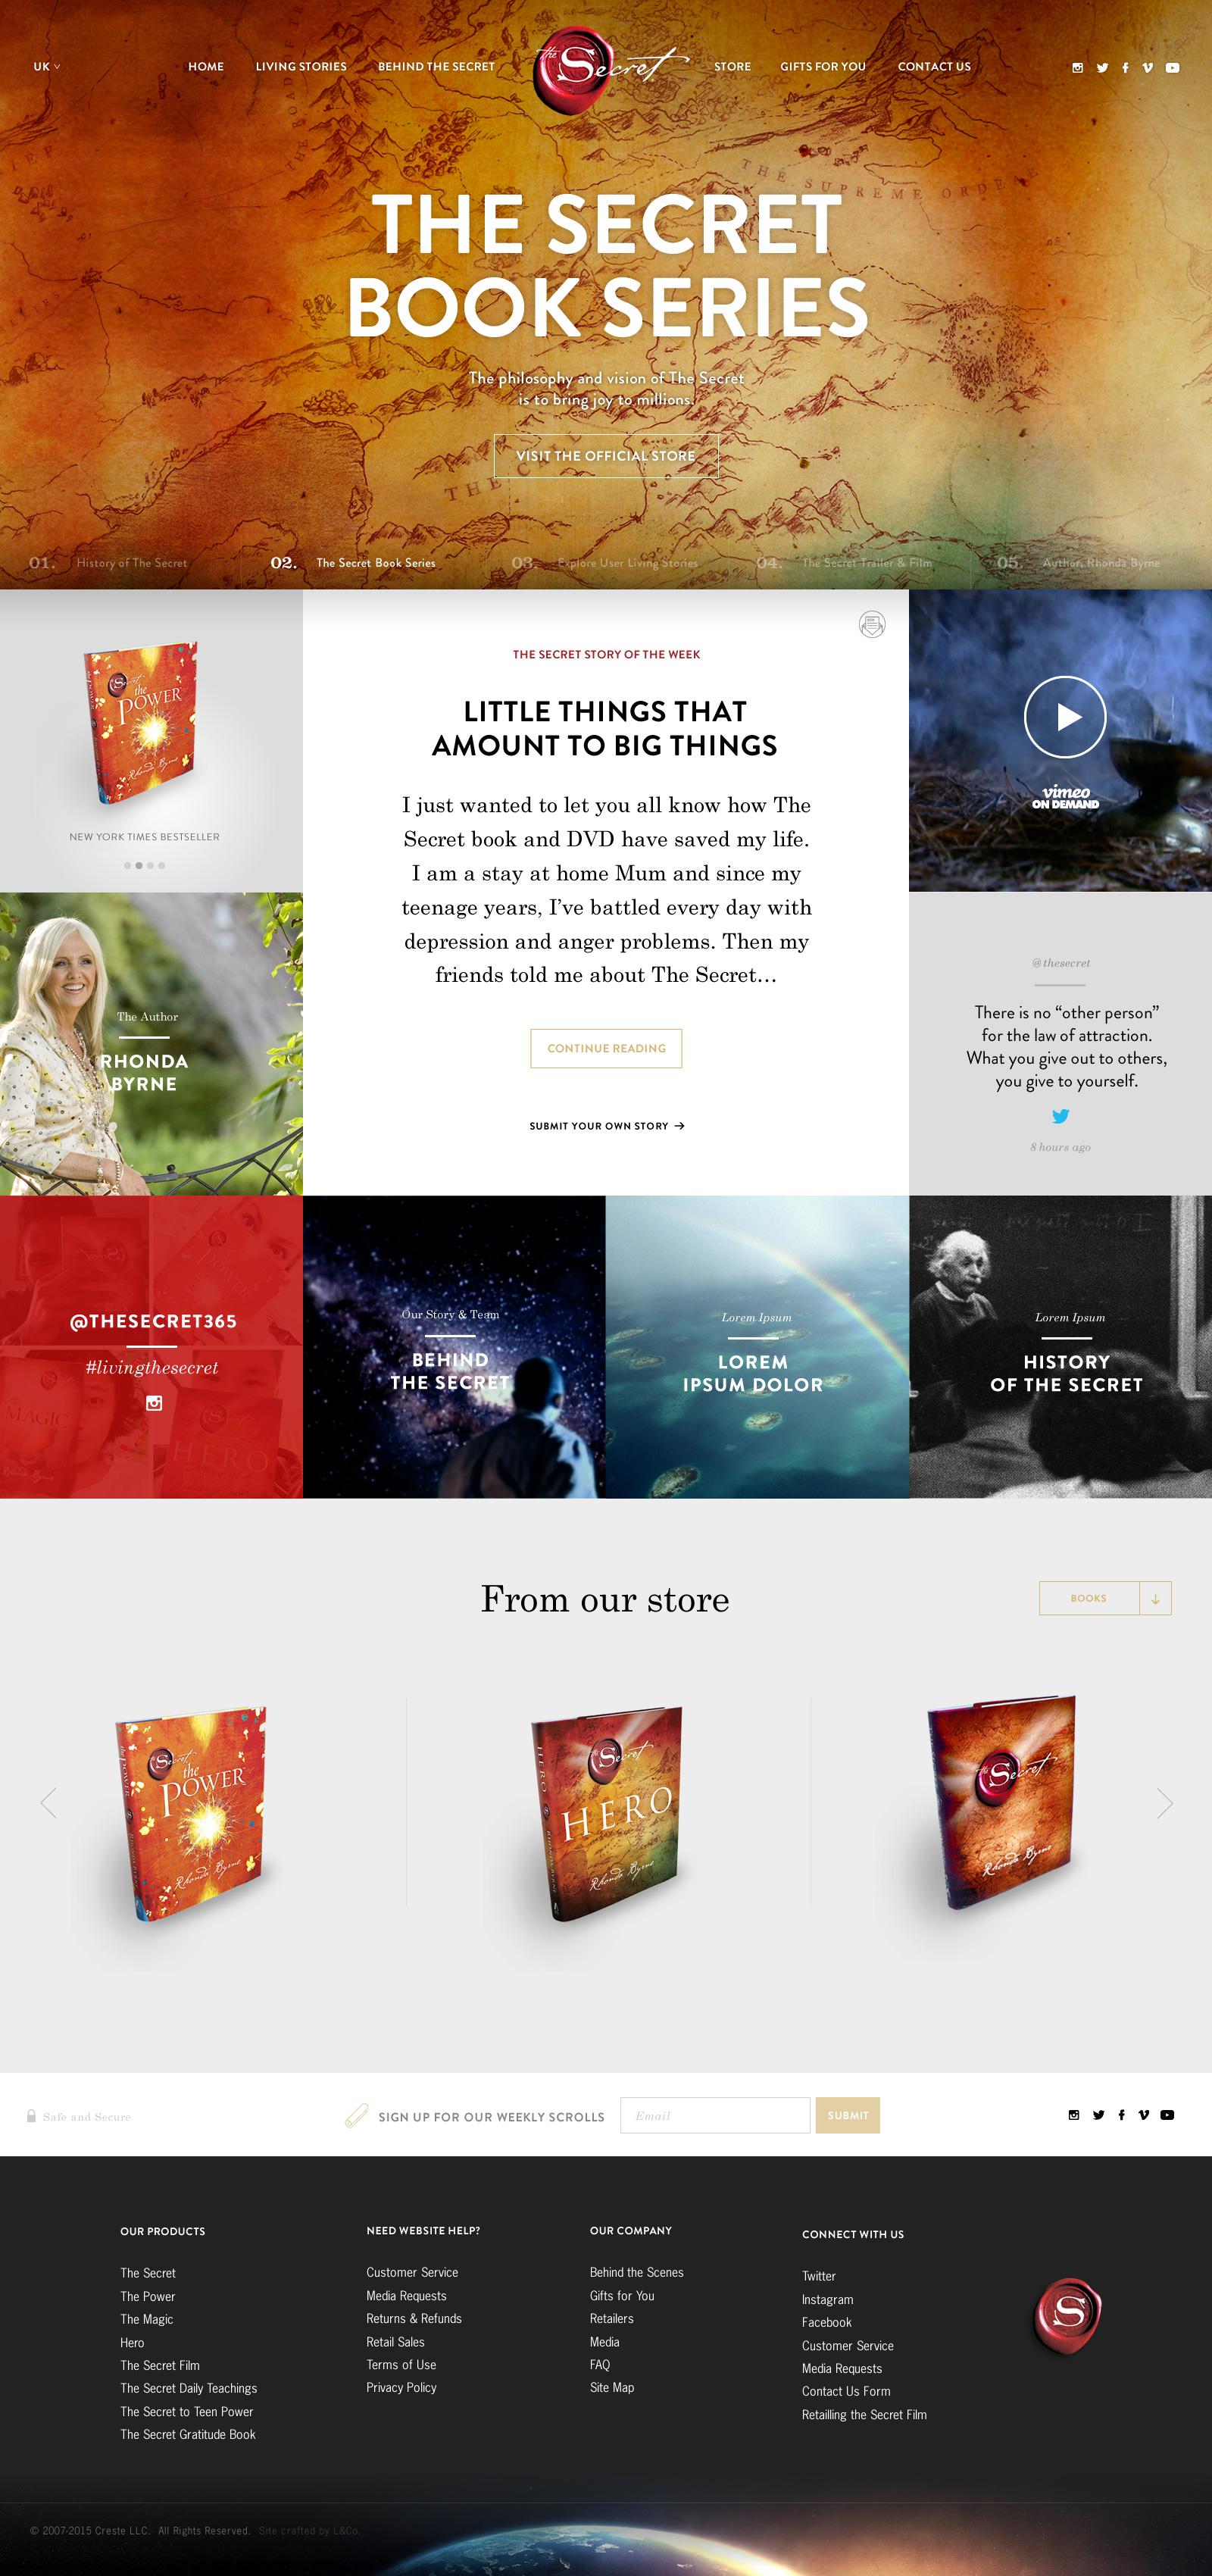 leo-basica-design-the-secret-web-design